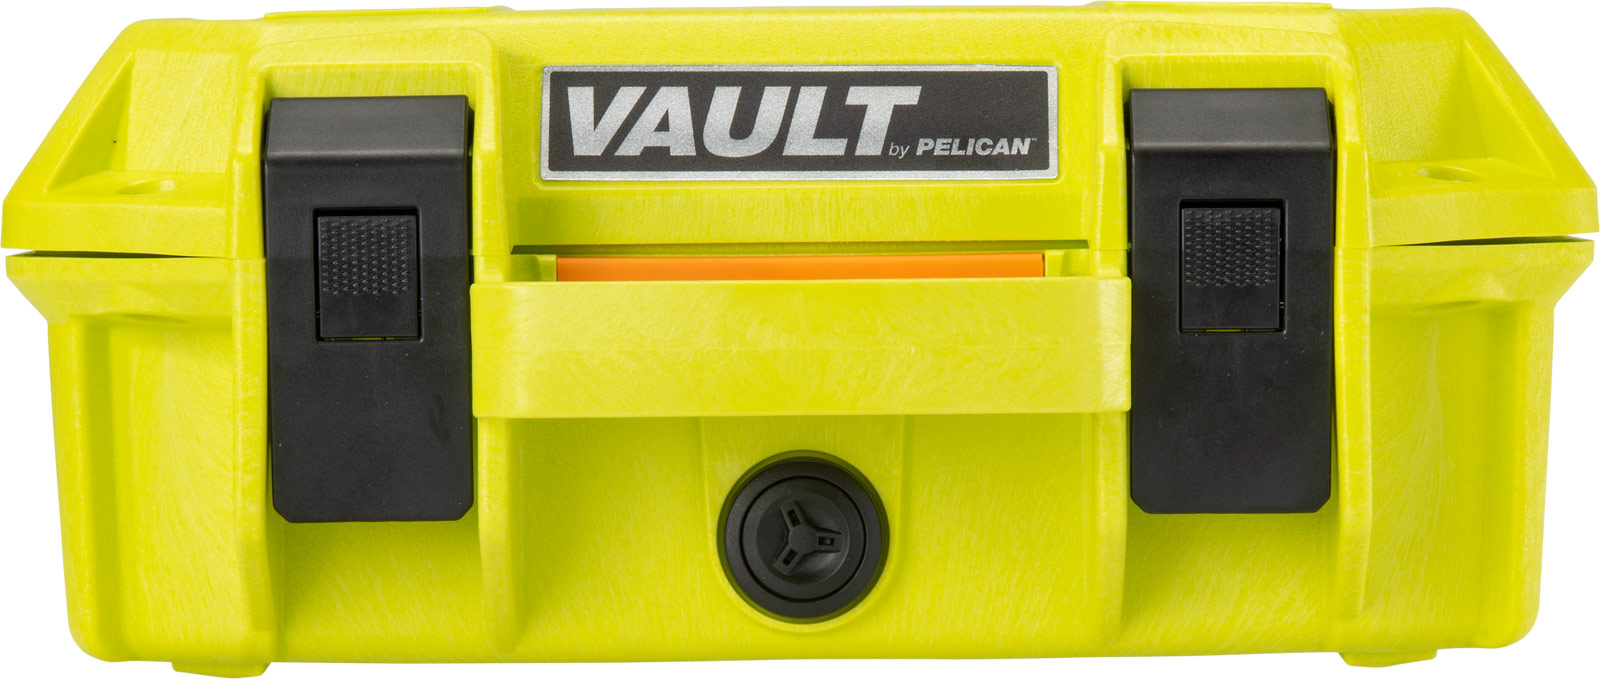 pelican vault equipment cases v100c